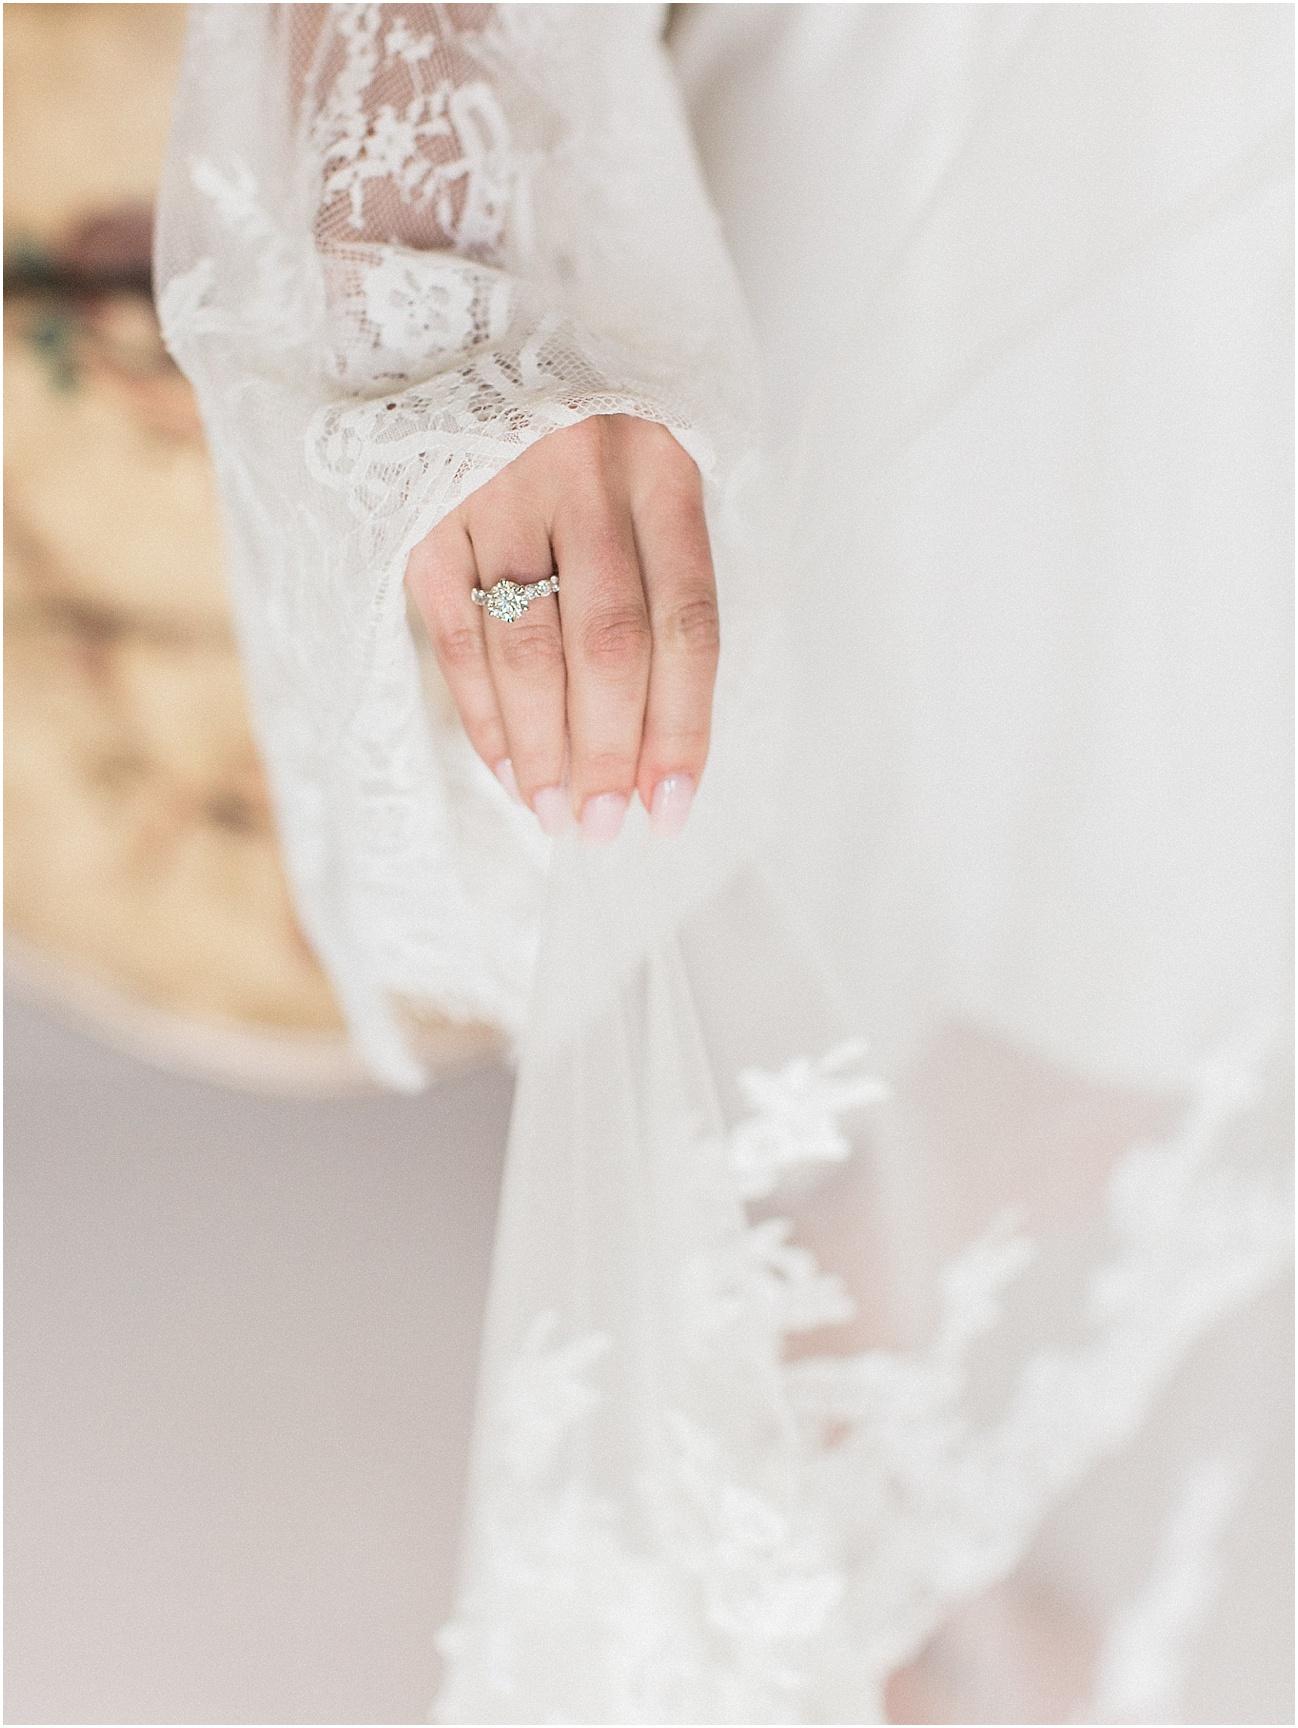 bianca_chris_danversport_italian_blush_gold_north_shore_cape_cod_boston_wedding_photographer_meredith_jane_photography_photo_1110.jpg